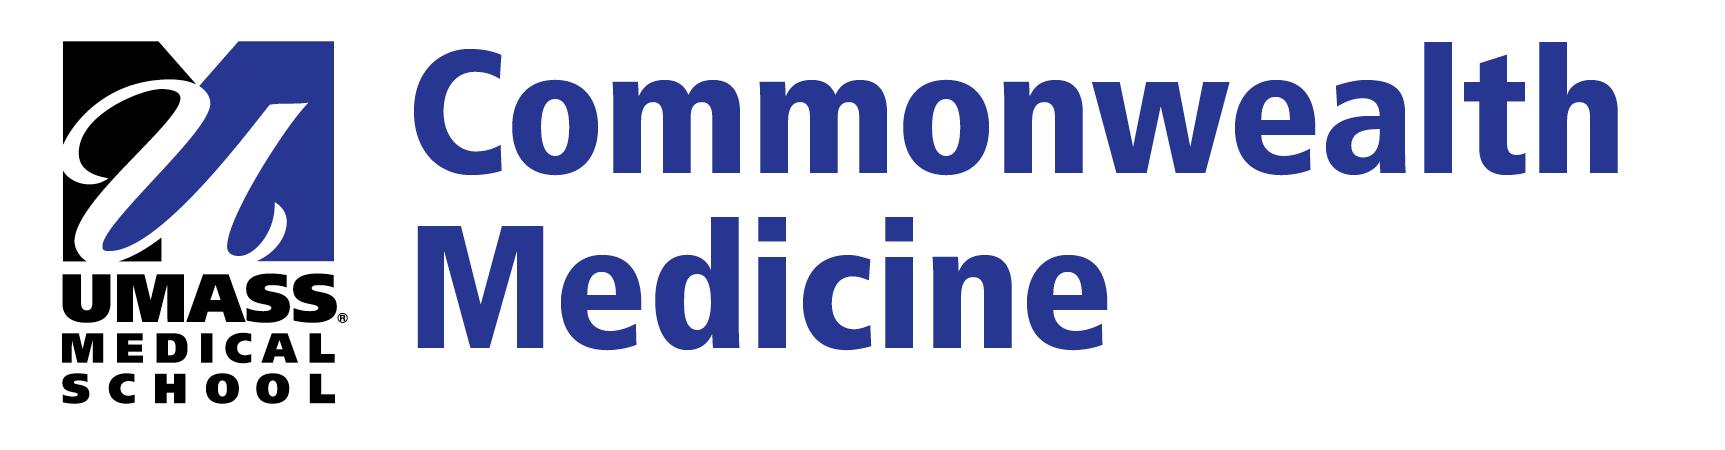 UMass Medical School Commonwealth Medicine logo Logo